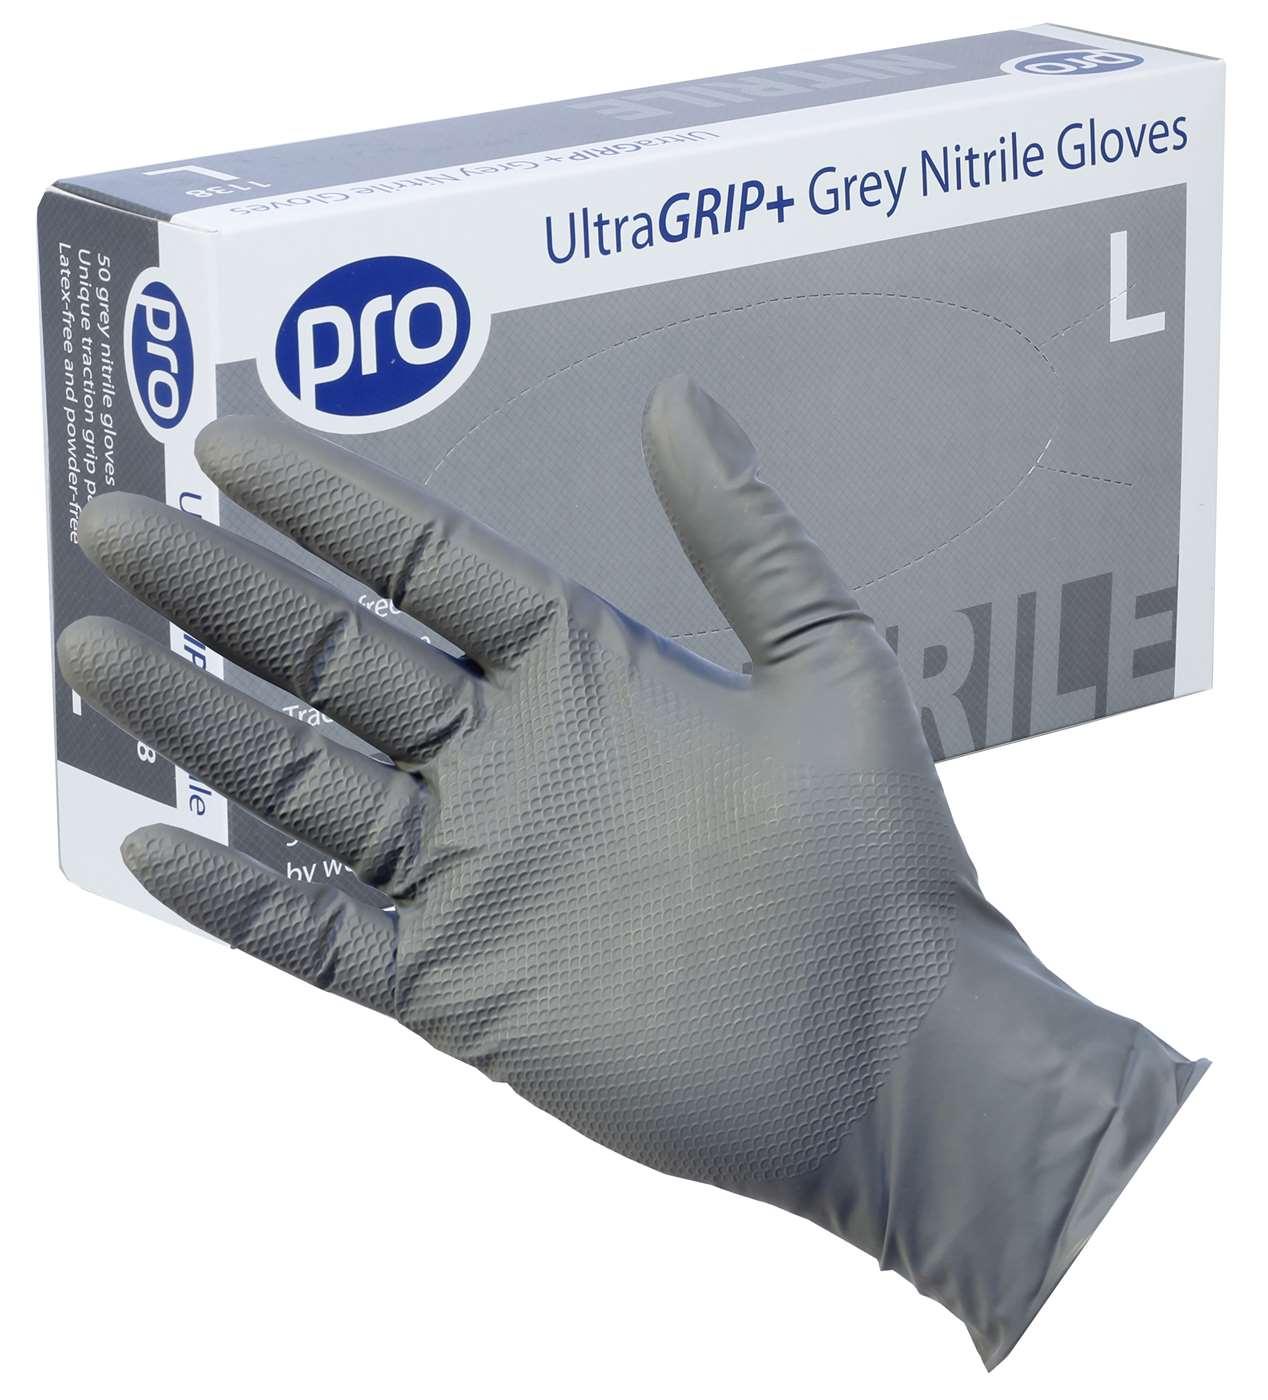 UltraGRIP+ Grey Nitrile Gloves